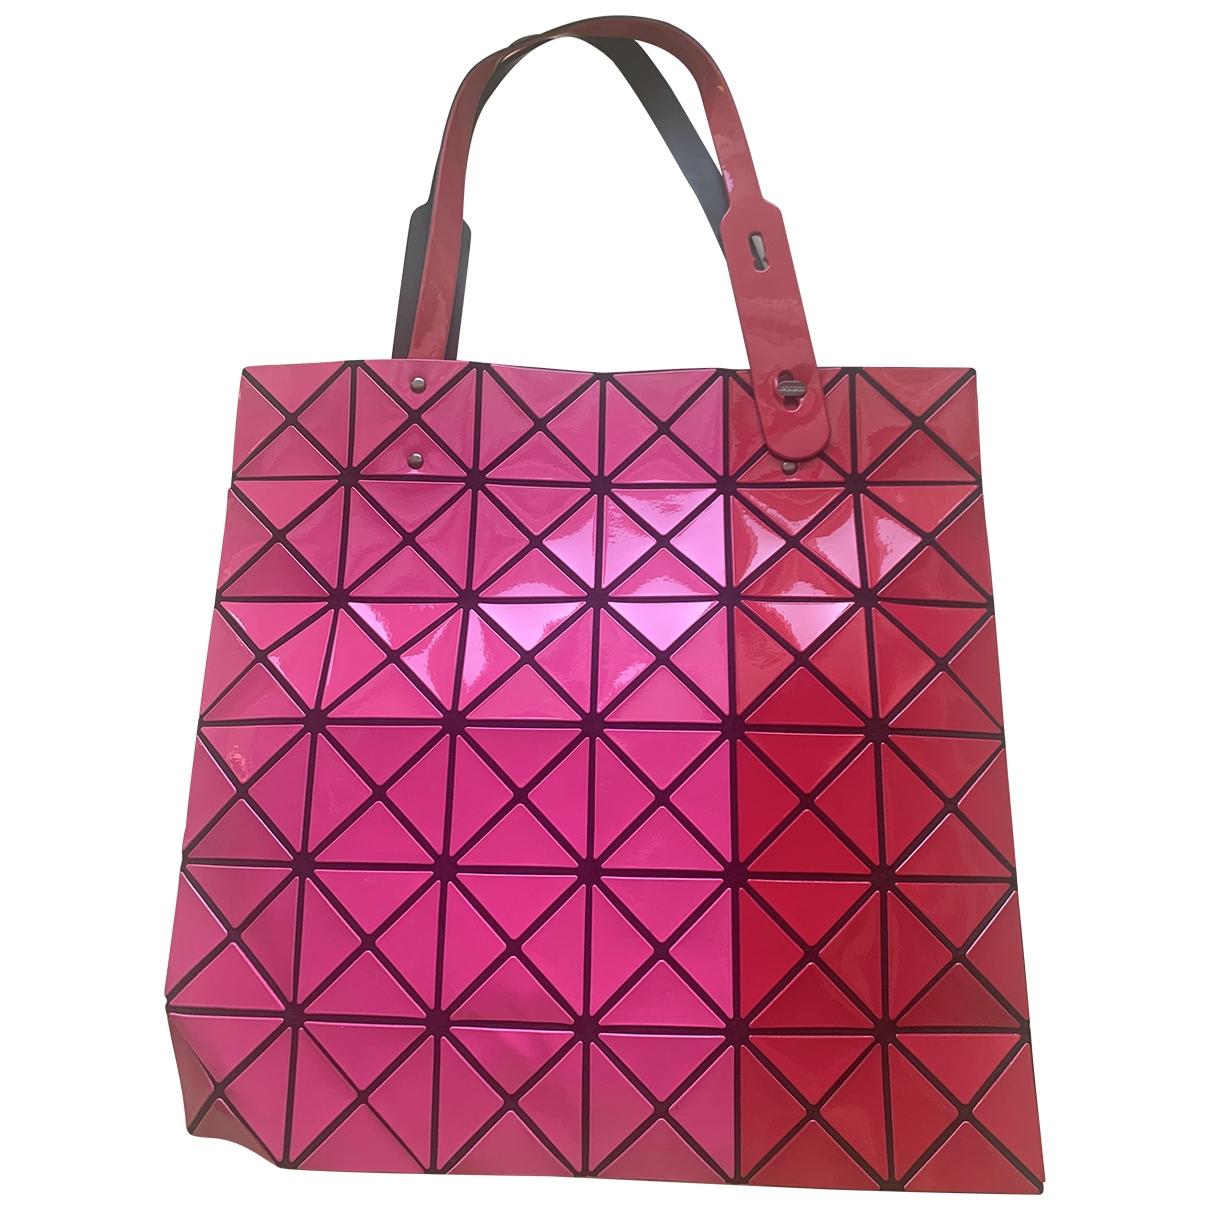 Issey Miyake \N Pink handbag for Women \N